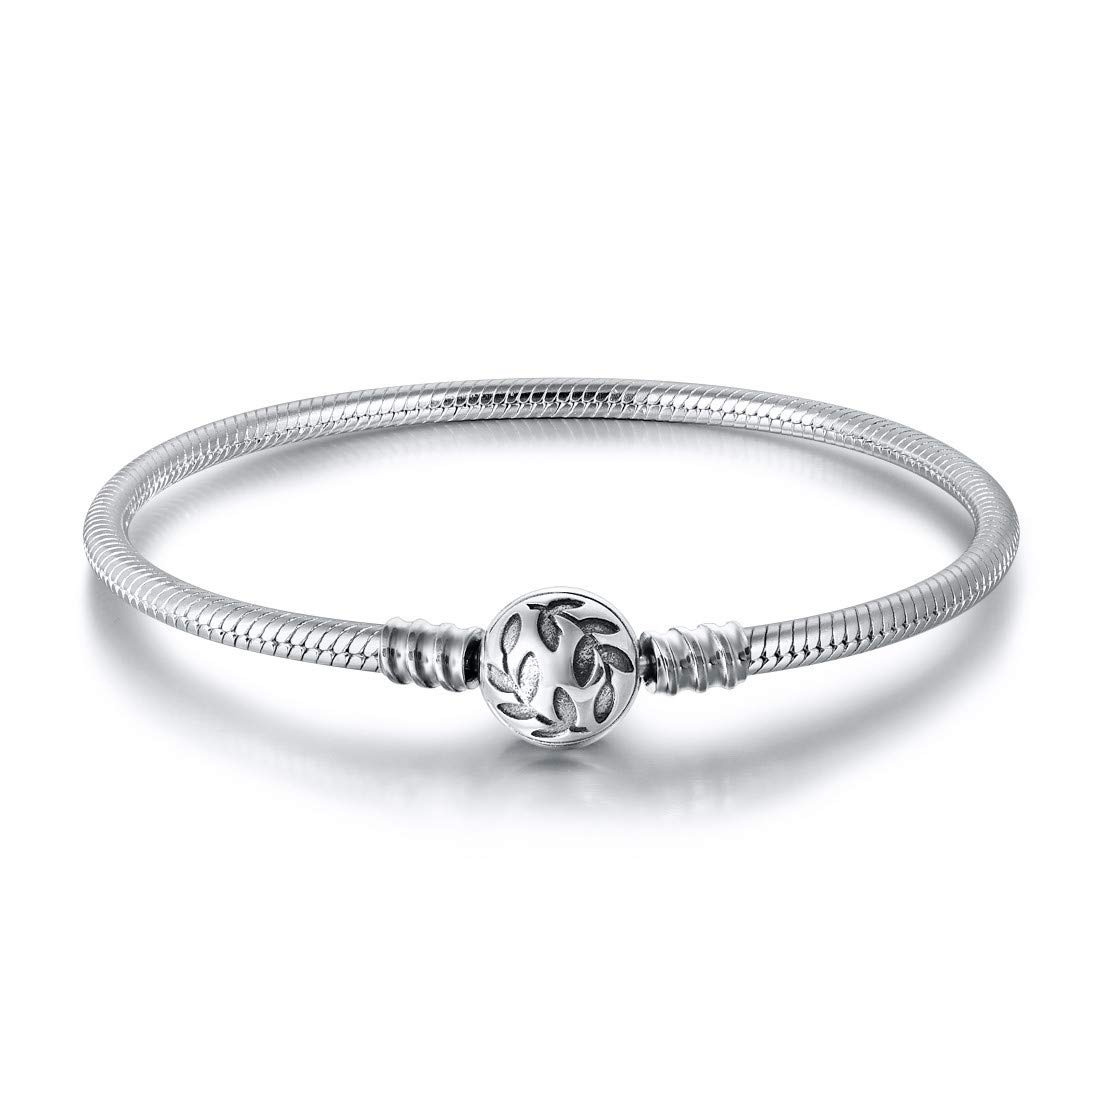 "DALARAN 925 Sterling Silver Charm Bracelet Snake Chain for Women Girls Fit for Standard Charms Bead 6.7""-7.9"""